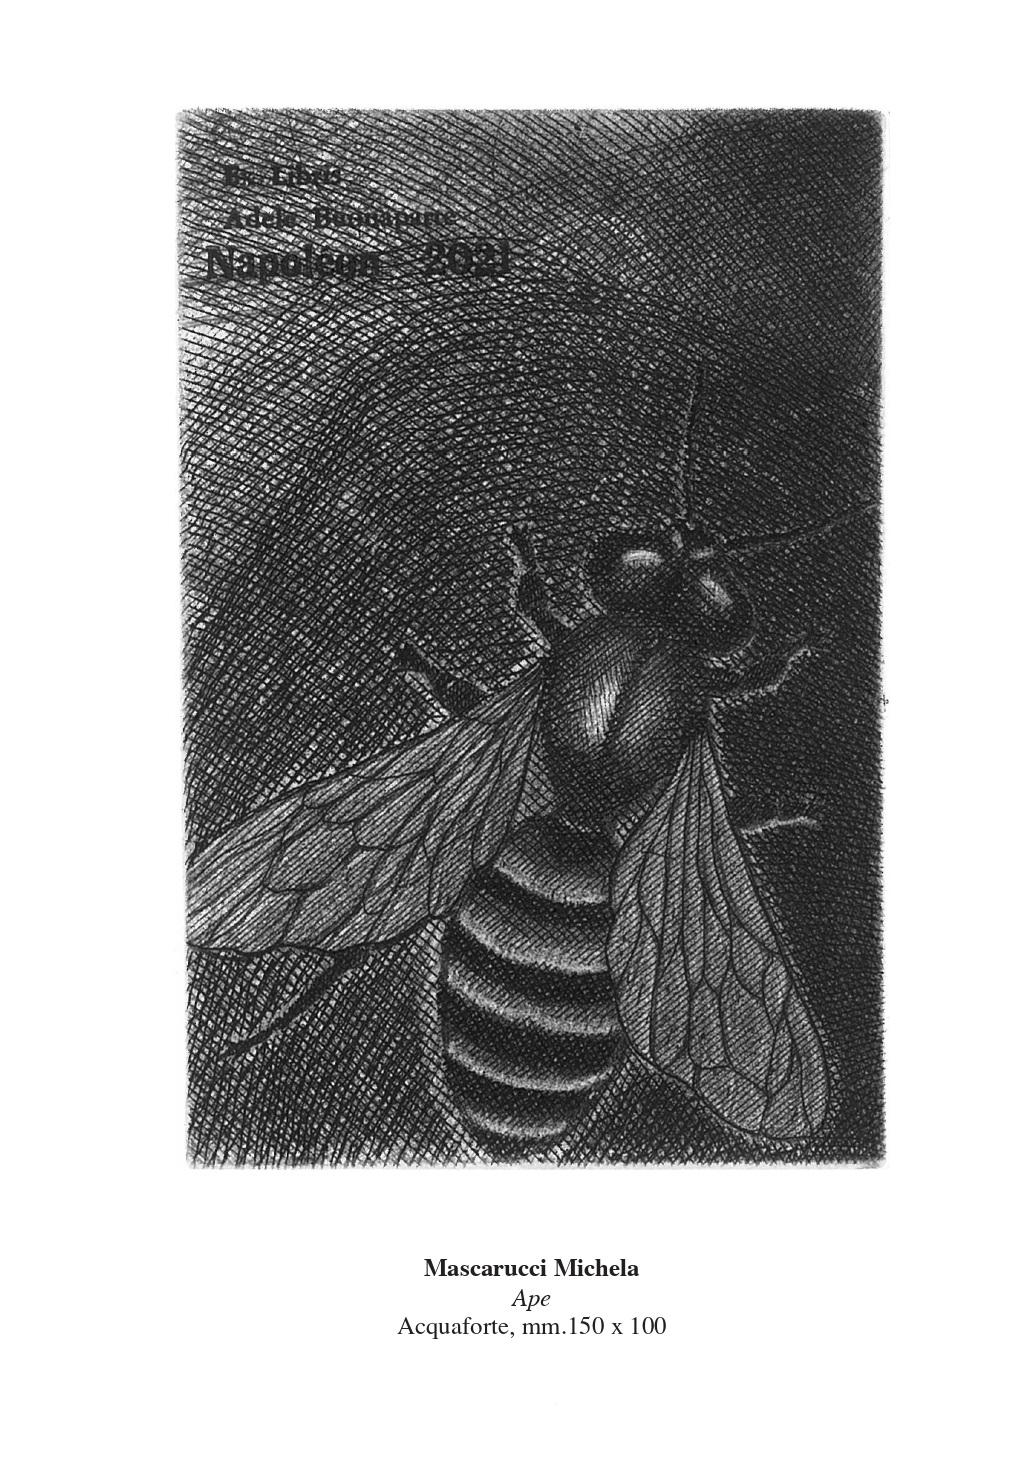 CATALOGO exlibris 2021-106_page-0001